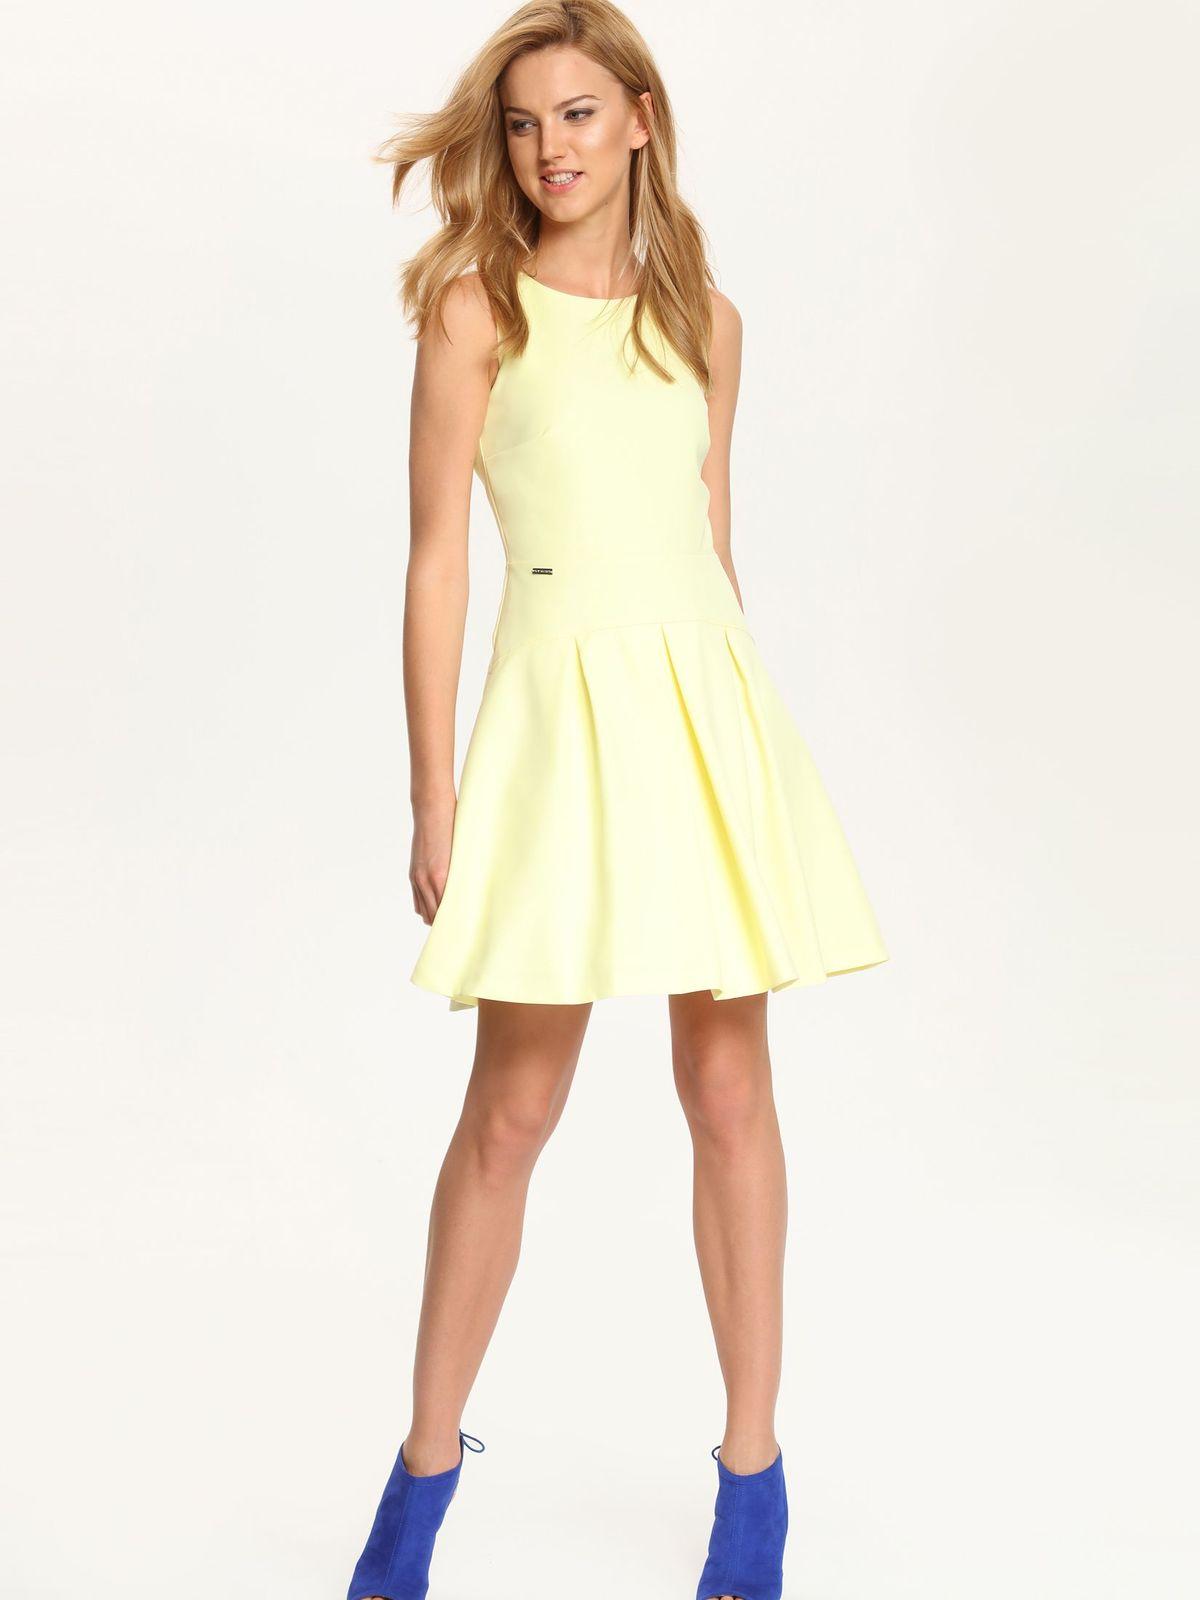 TOP SECRET κομψο κλος φορεμα